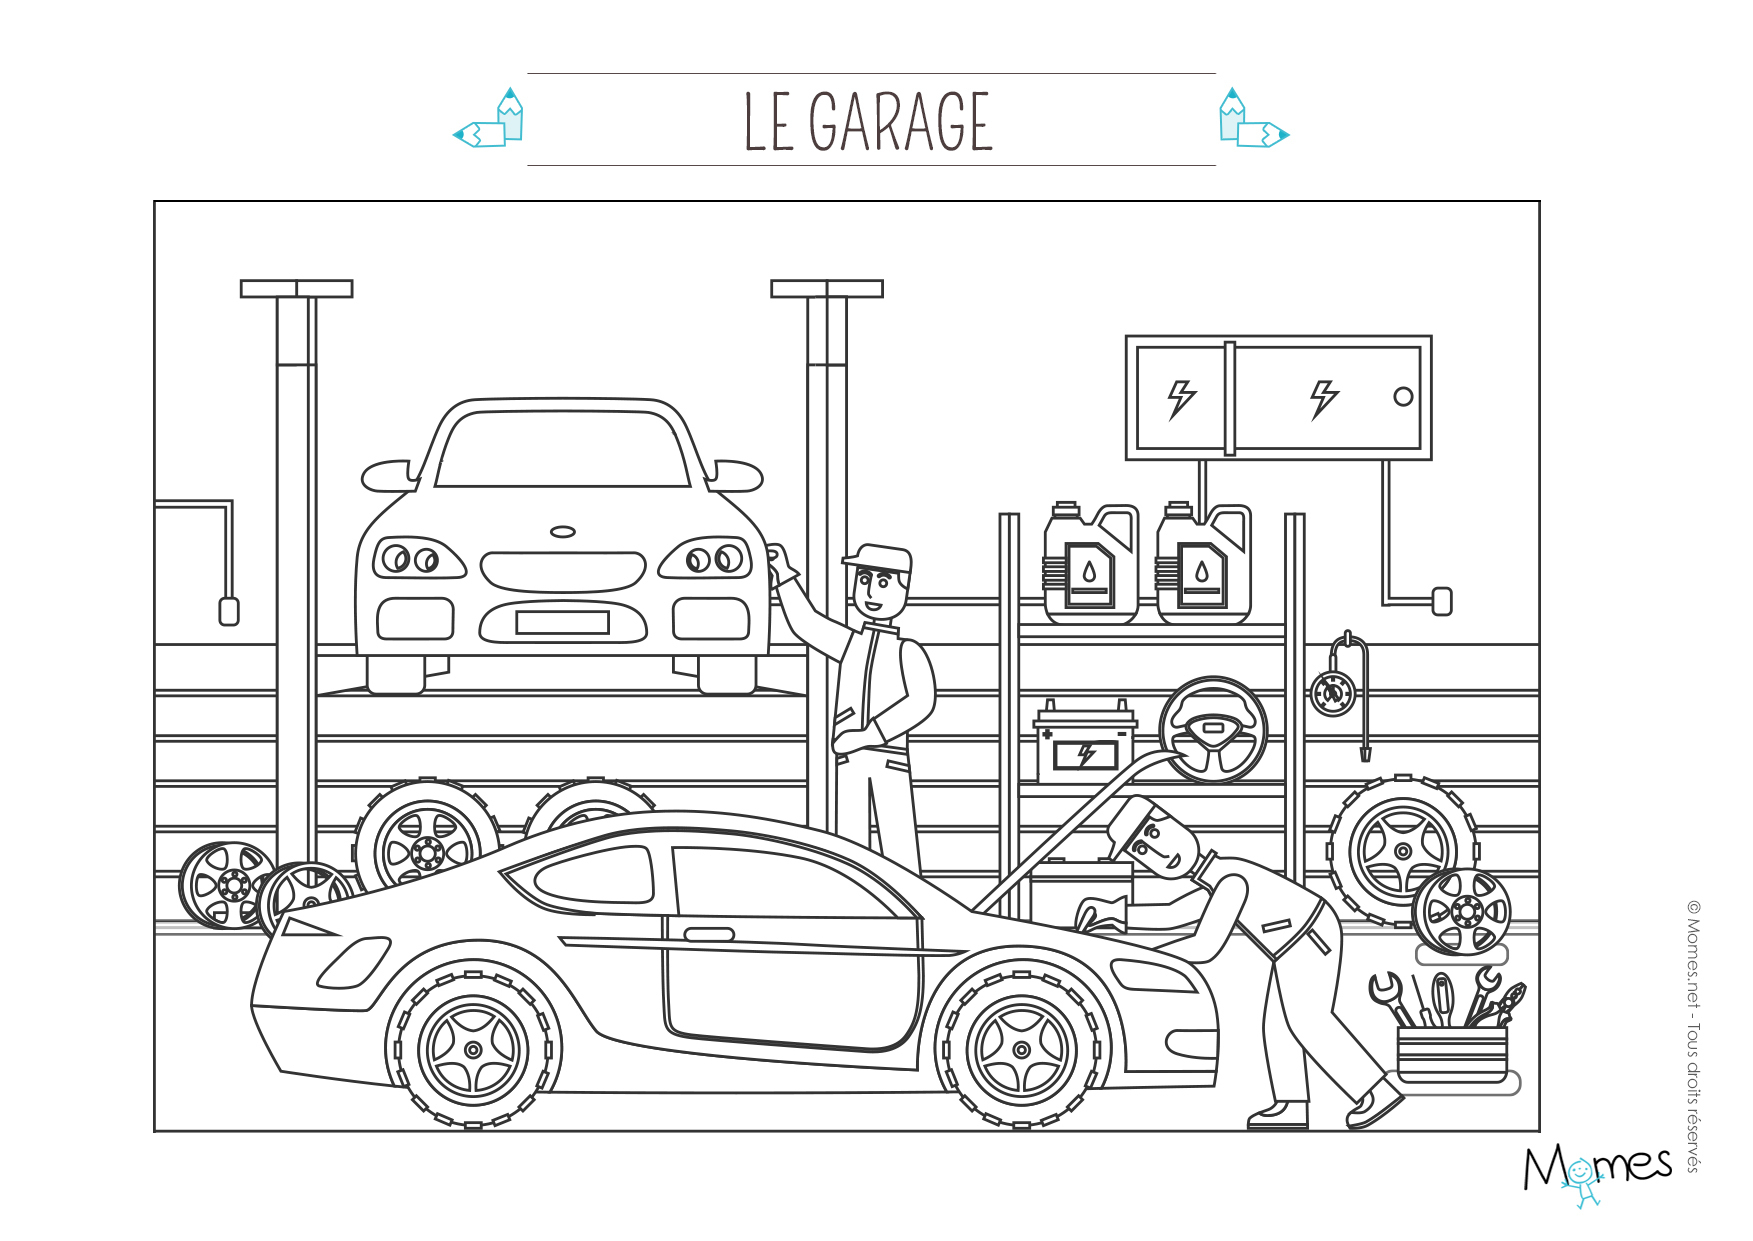 Coloriage Le Garage Automobile - Momes concernant Coloriage Vehicule